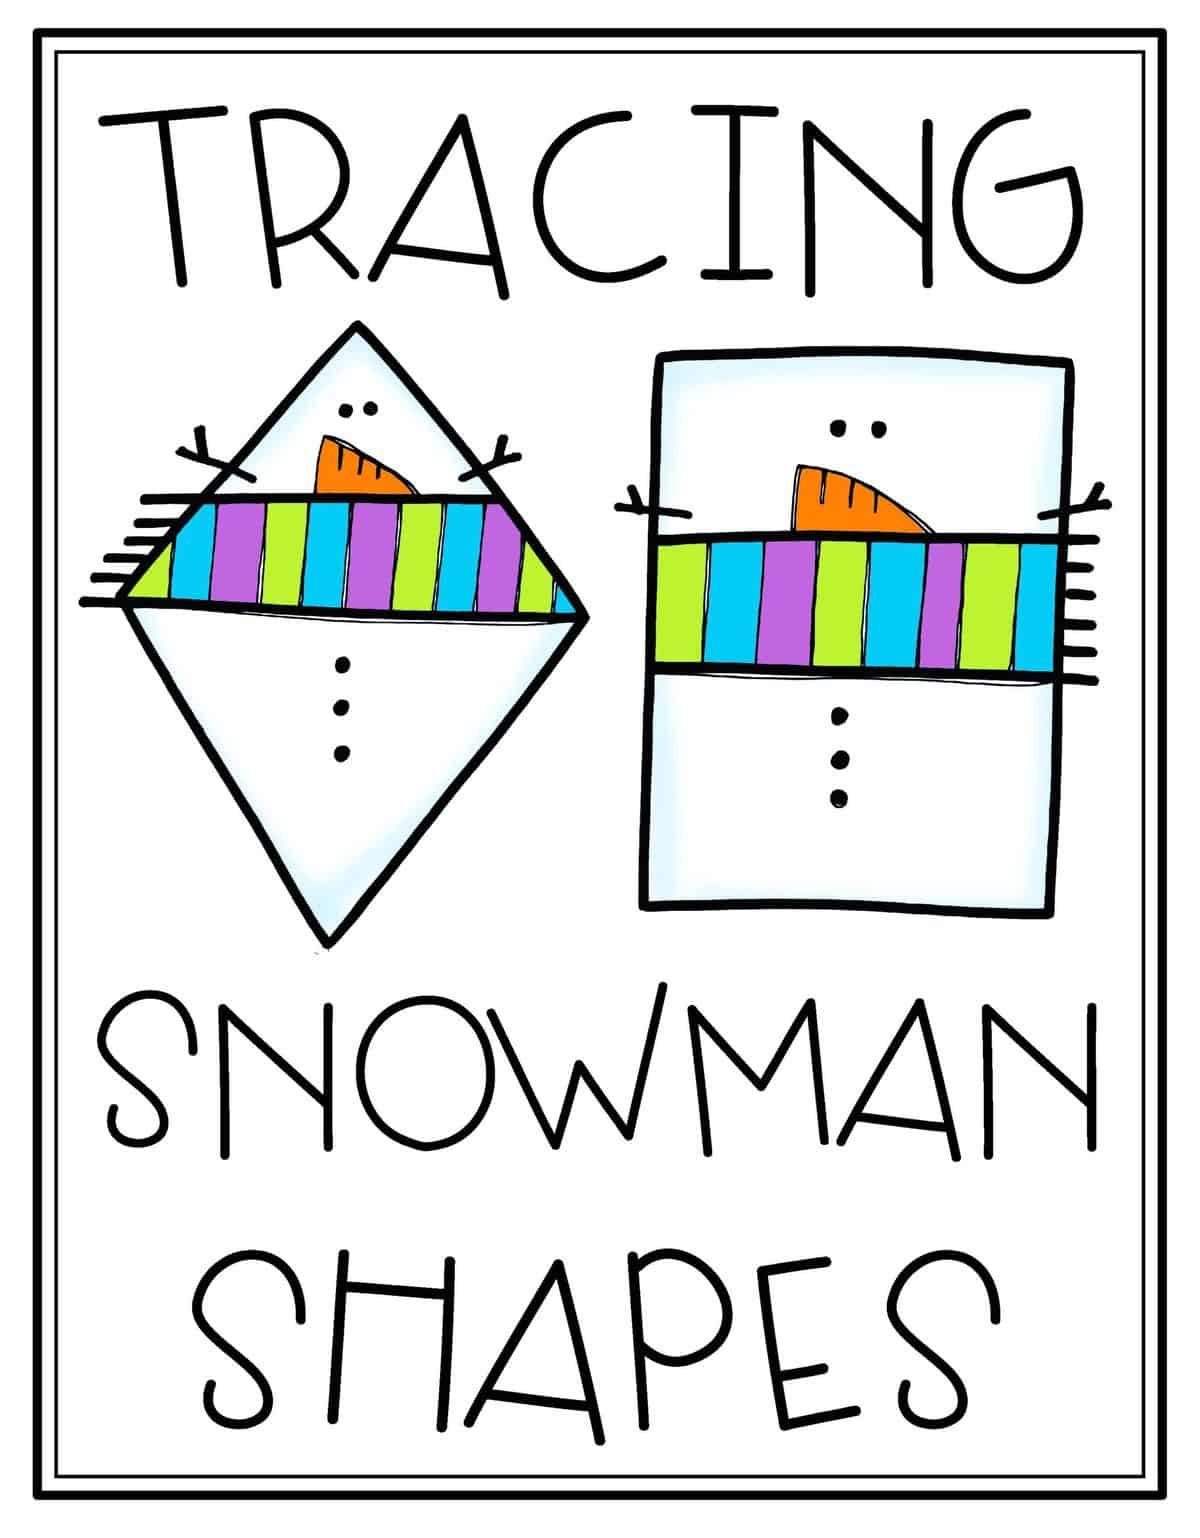 Tracing Snowman Shapes Activity